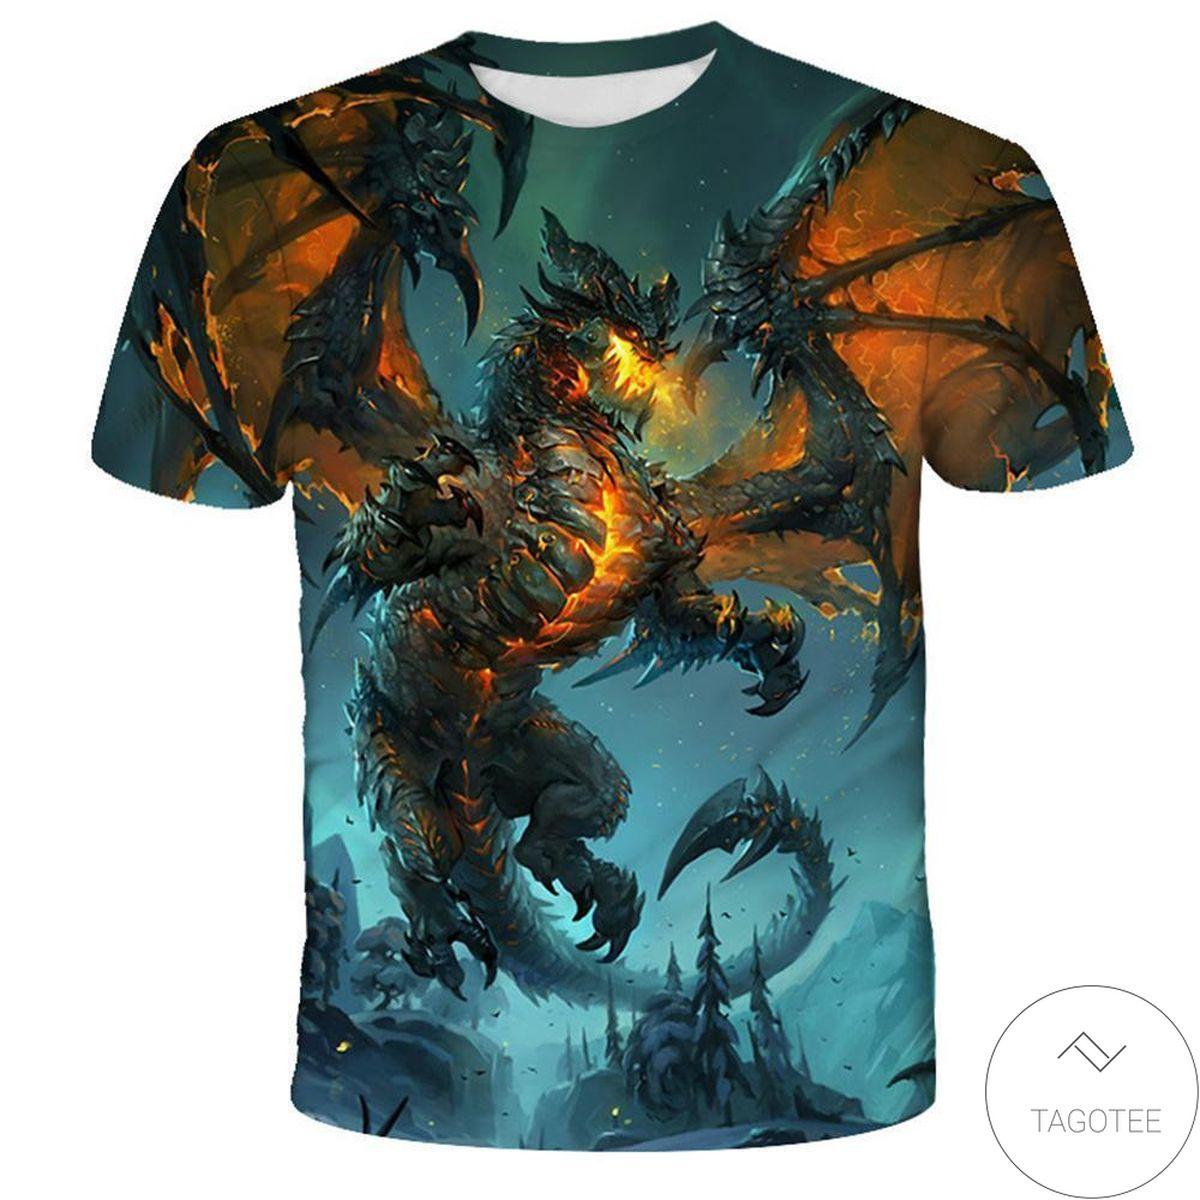 Print On Demand The Dragon 3d Graphic Printed Short Sleeve Shirt